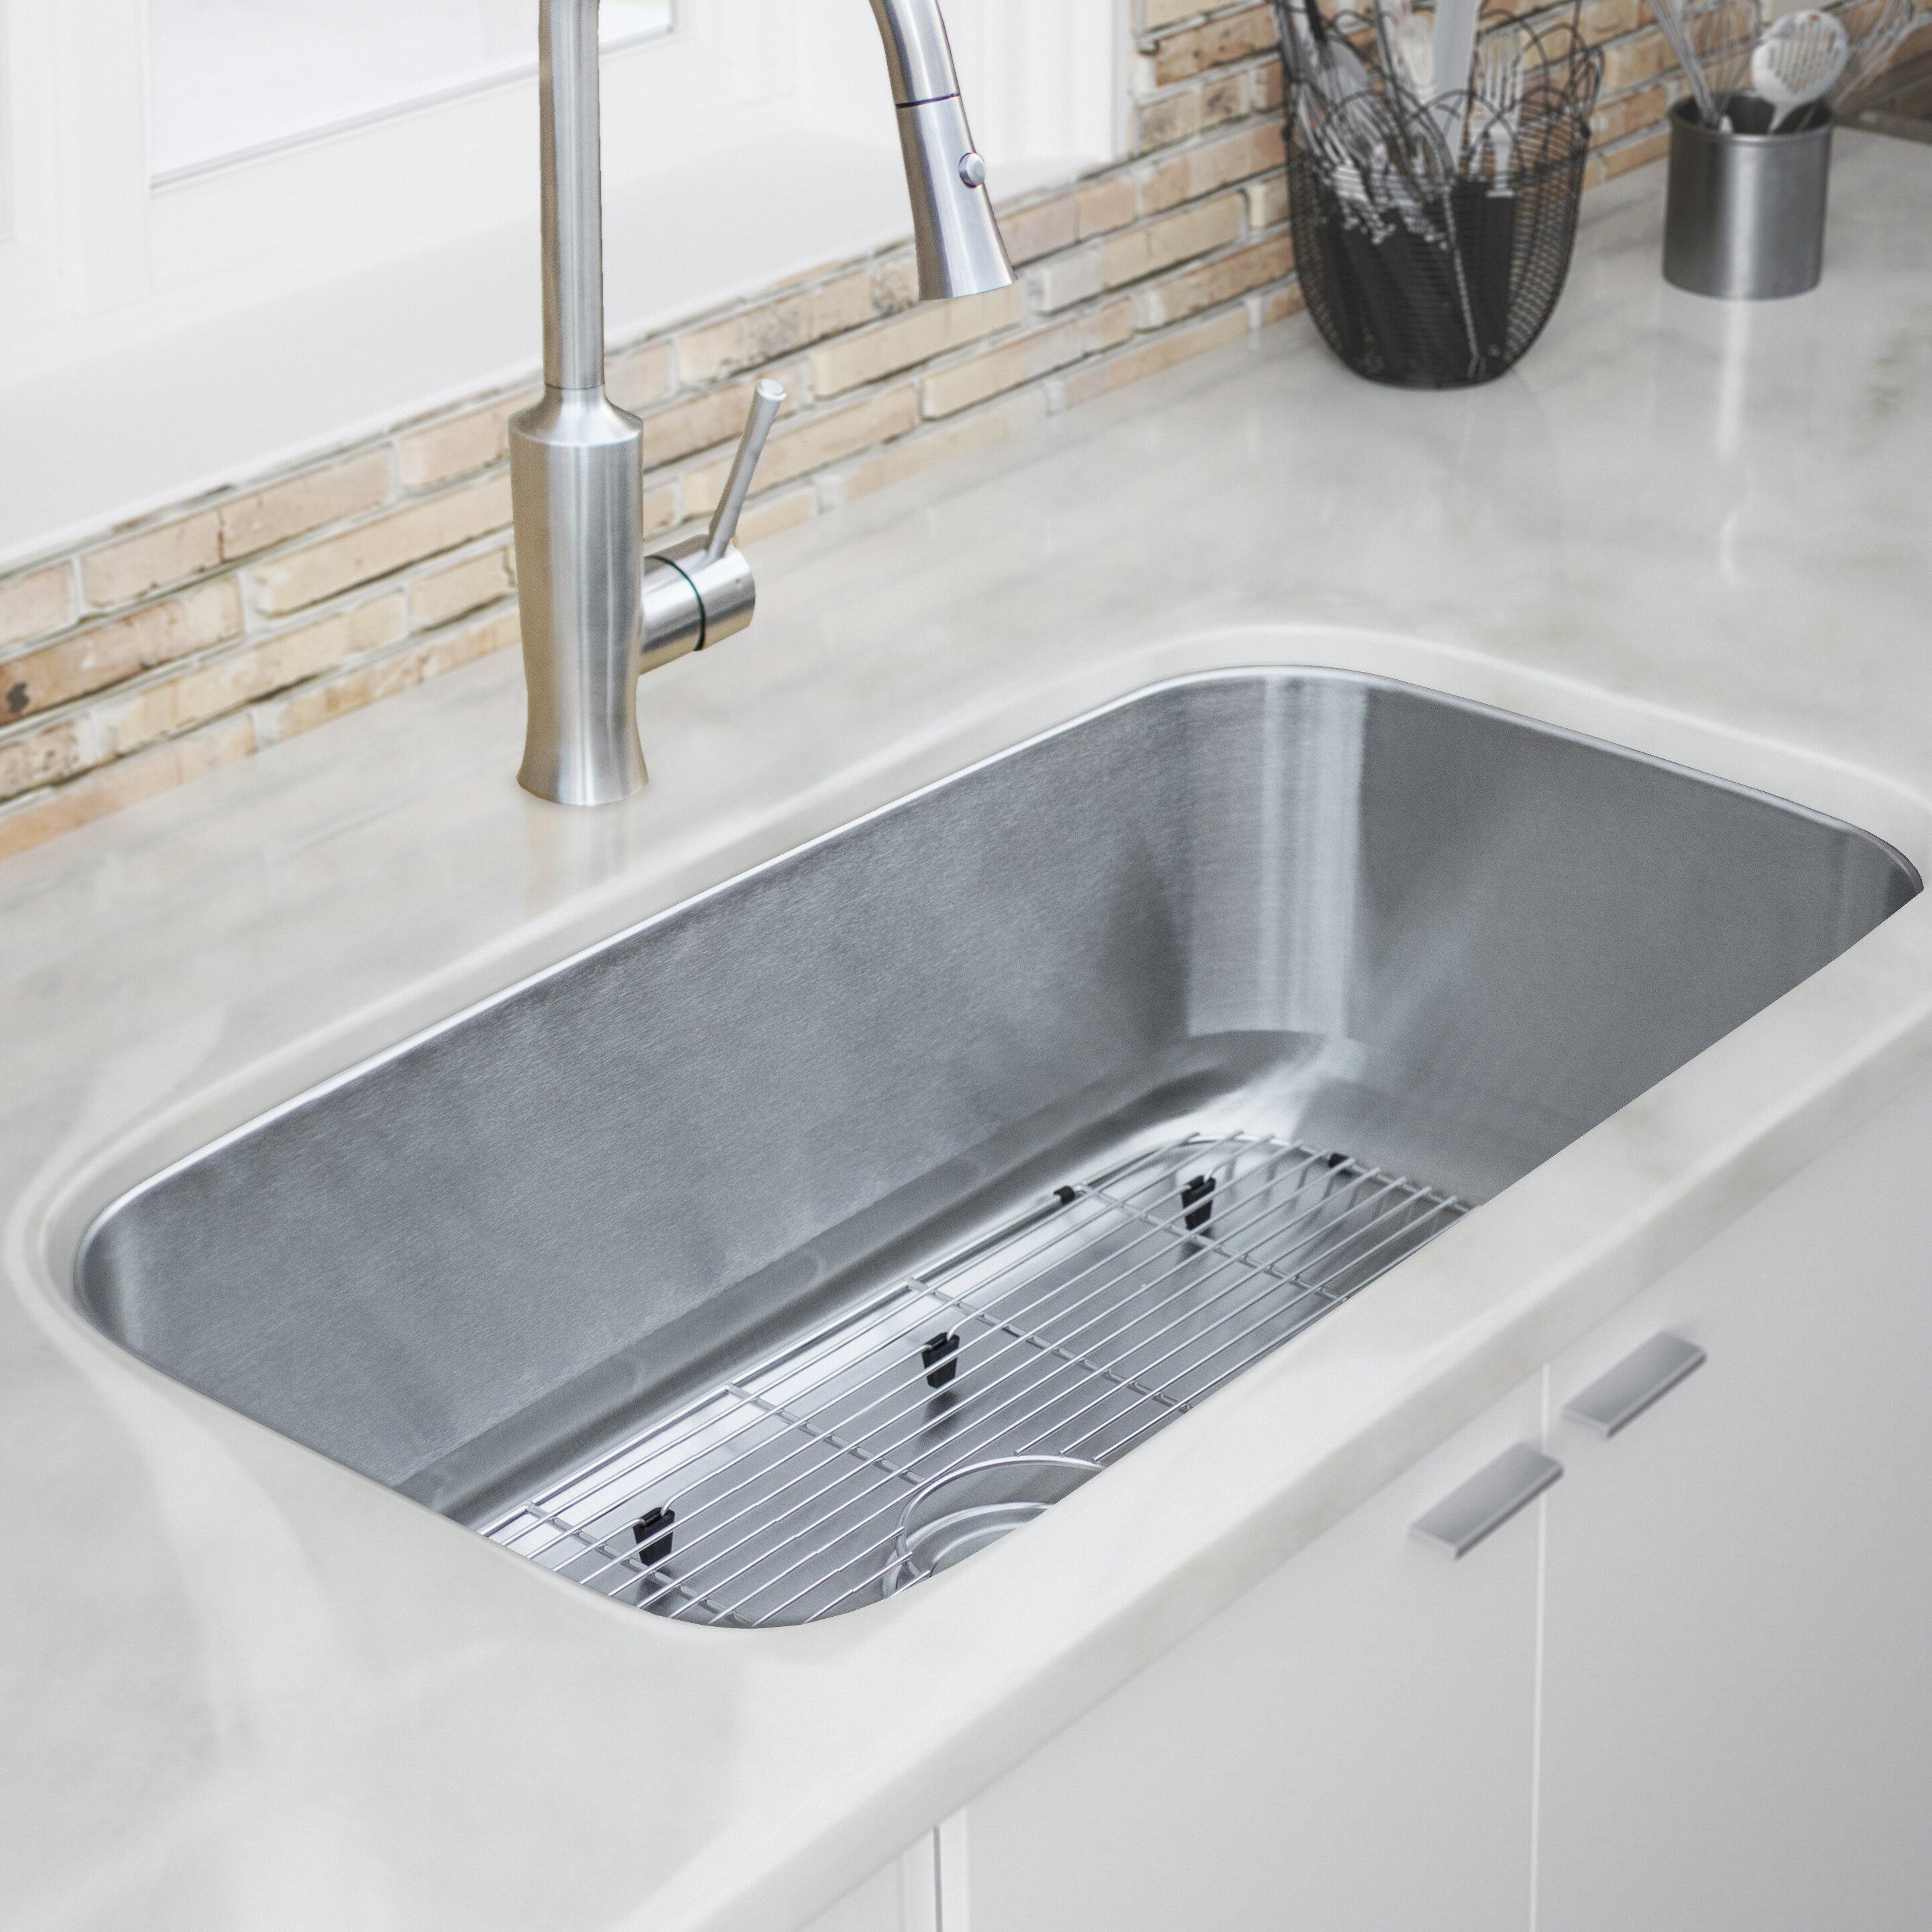 Ticor Sinks 31.5\